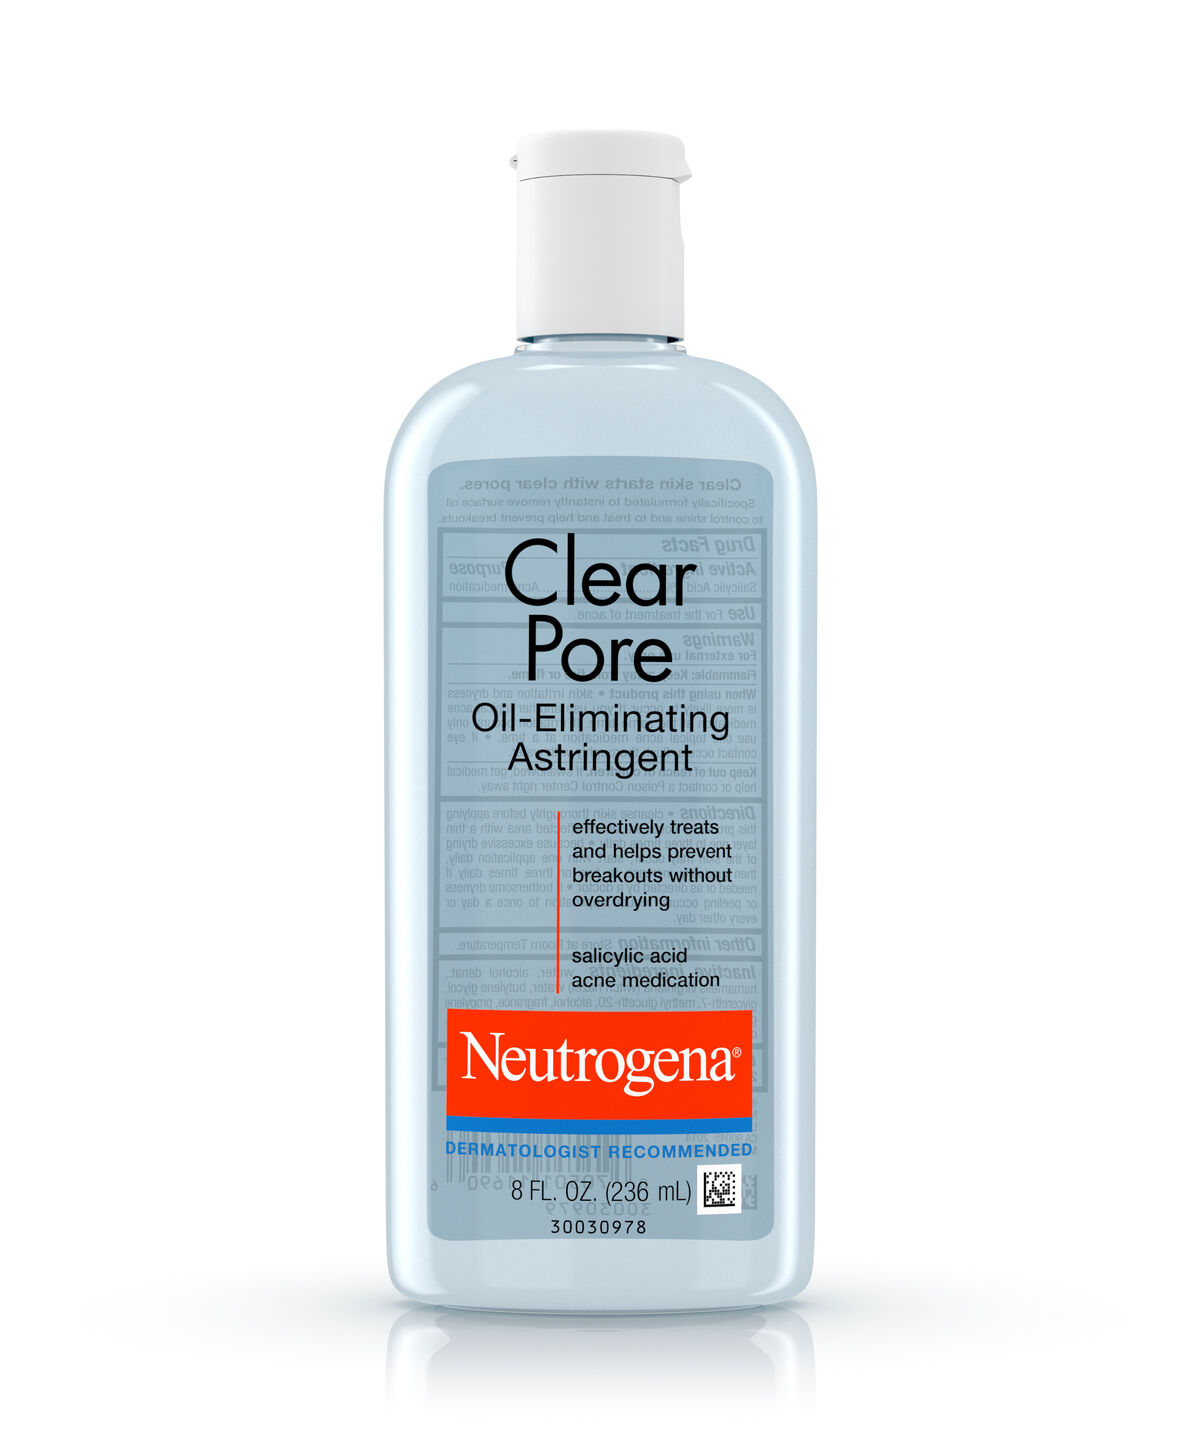 Neutrogena Rapid Wrinkle Repair Night Cream Remove Skin Tags With Tea Tree Oil Best Cream For Wrinkles On Neck Neutrogena Rapid Wrinkle Repair Night Cream Dermatology.